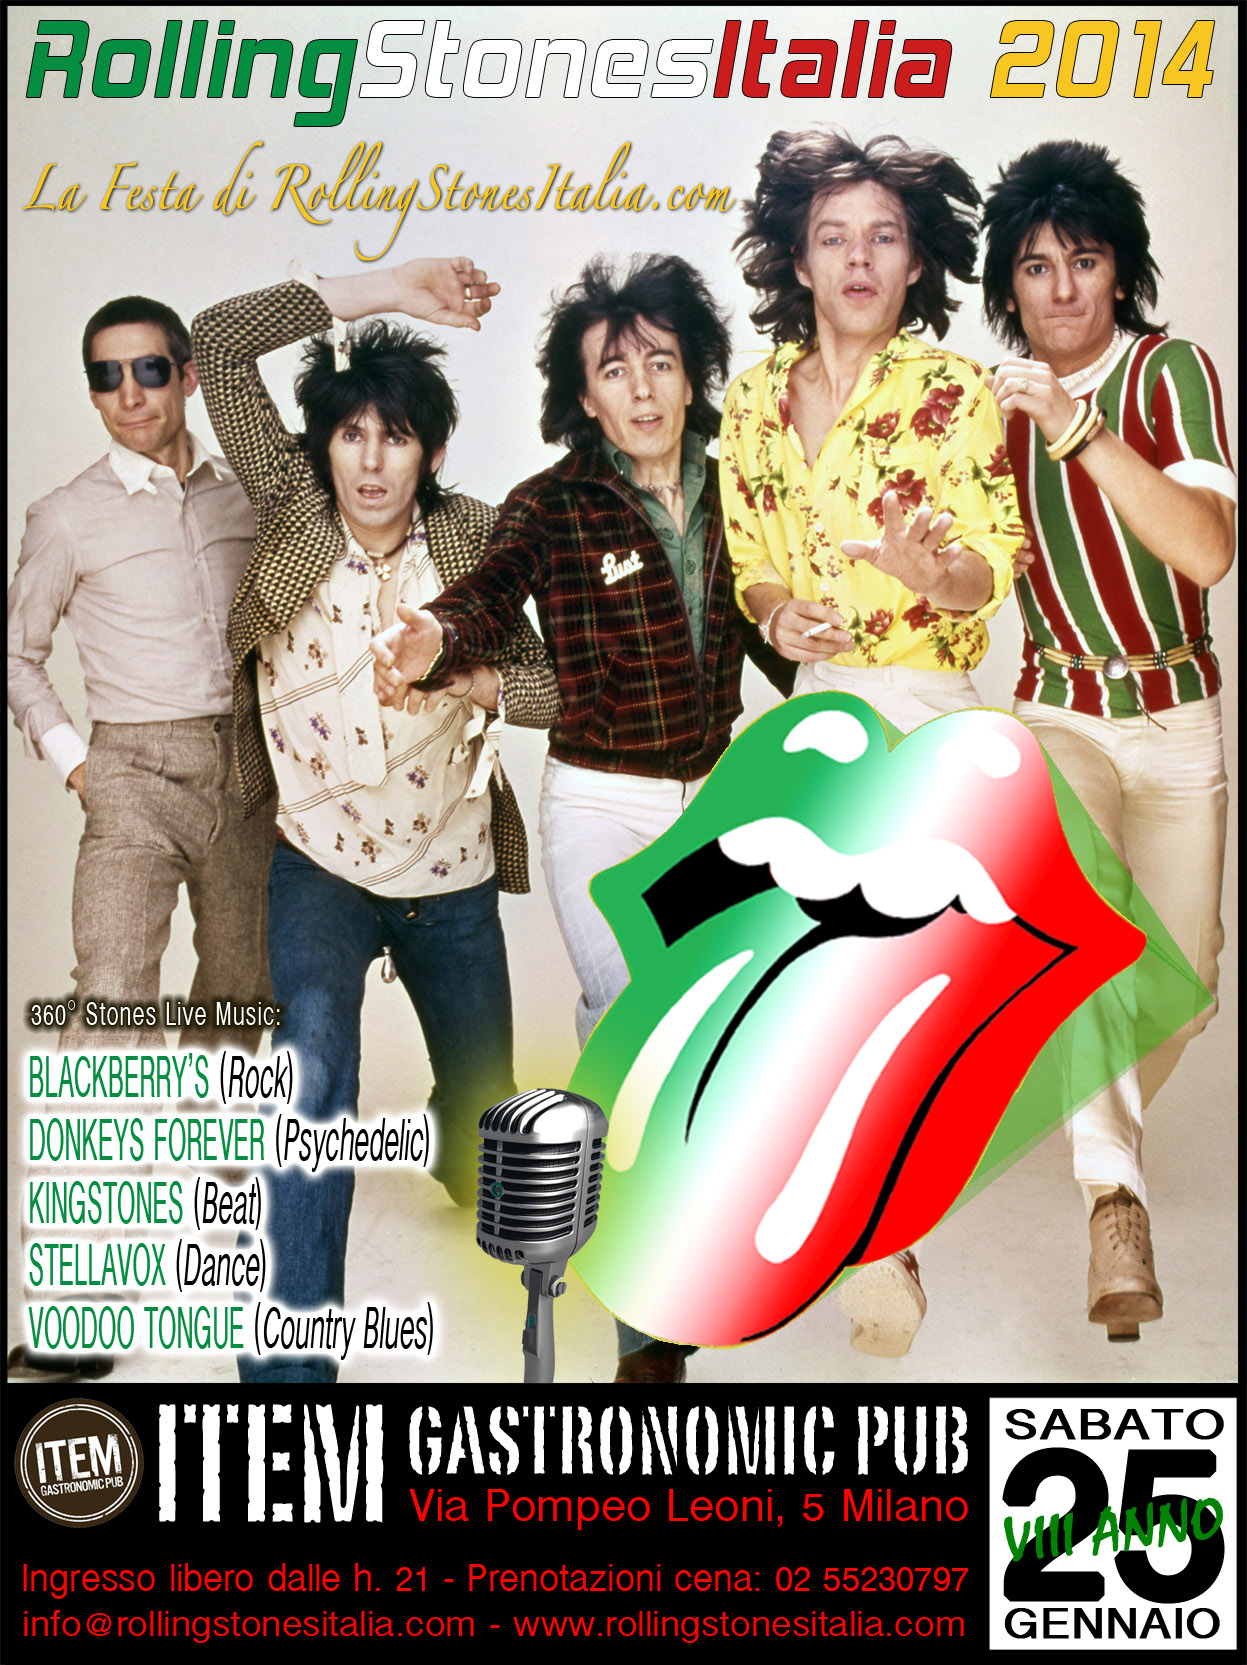 http://www.rollingstonesitalia.com/img/speciali/2014/flyer.jpg